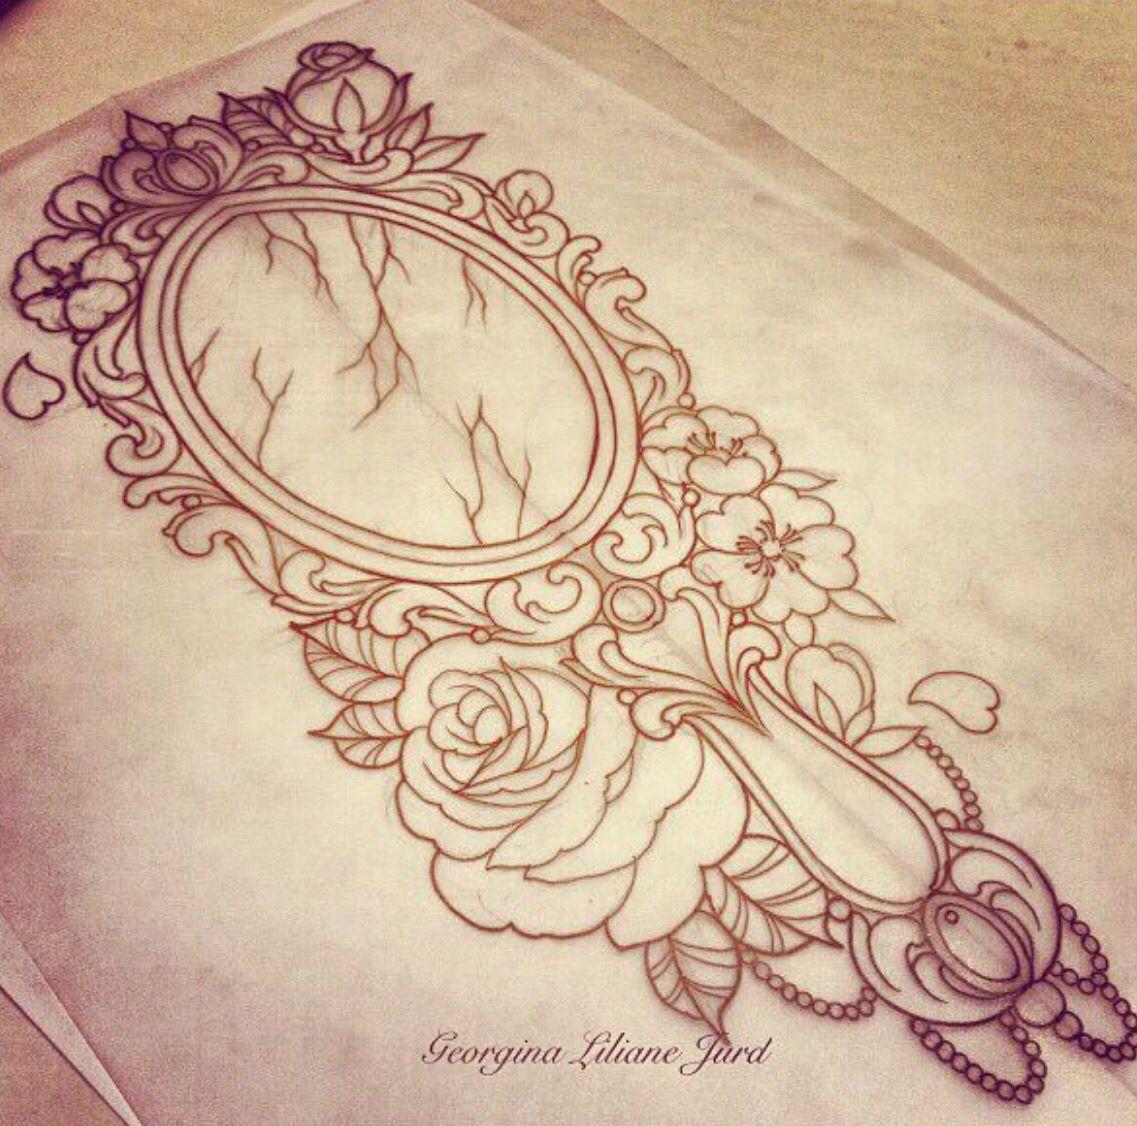 Antique Mirror Sketch Mirror Tattoos Sleeve Tattoos Tattoos